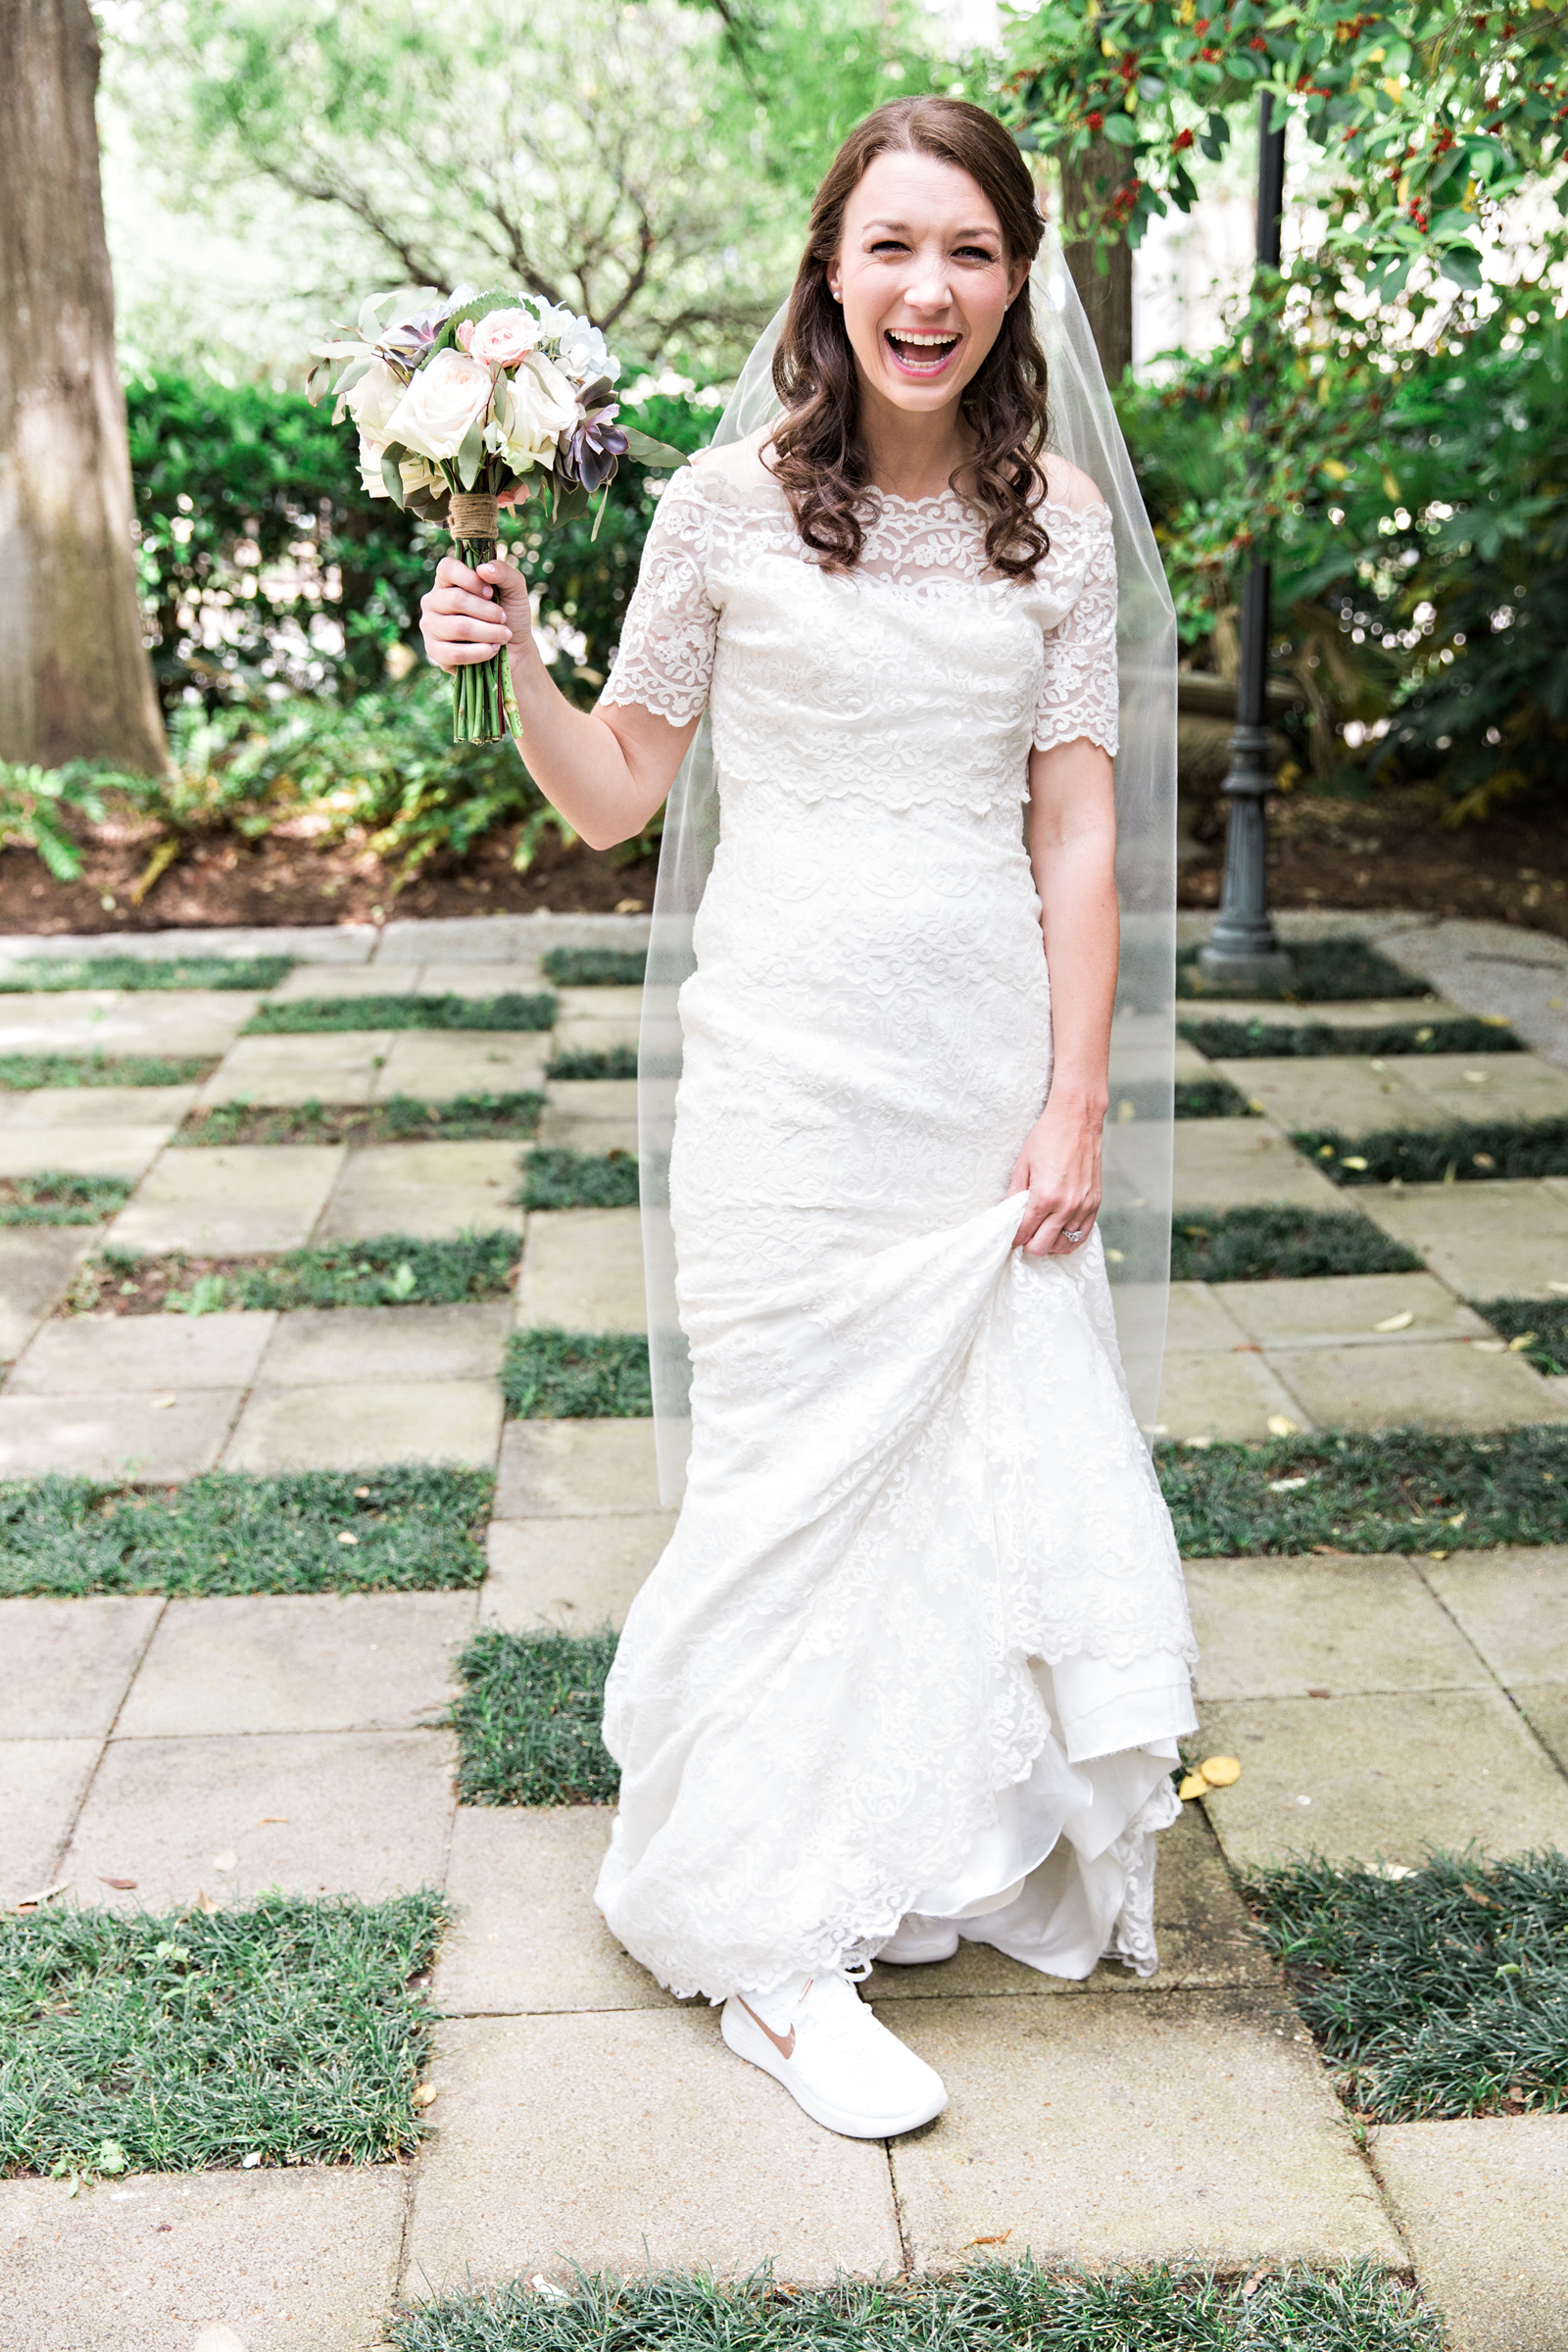 Ni ck-Drollette-Photography-Montgomery-Alabama-Weddings-131.jpg